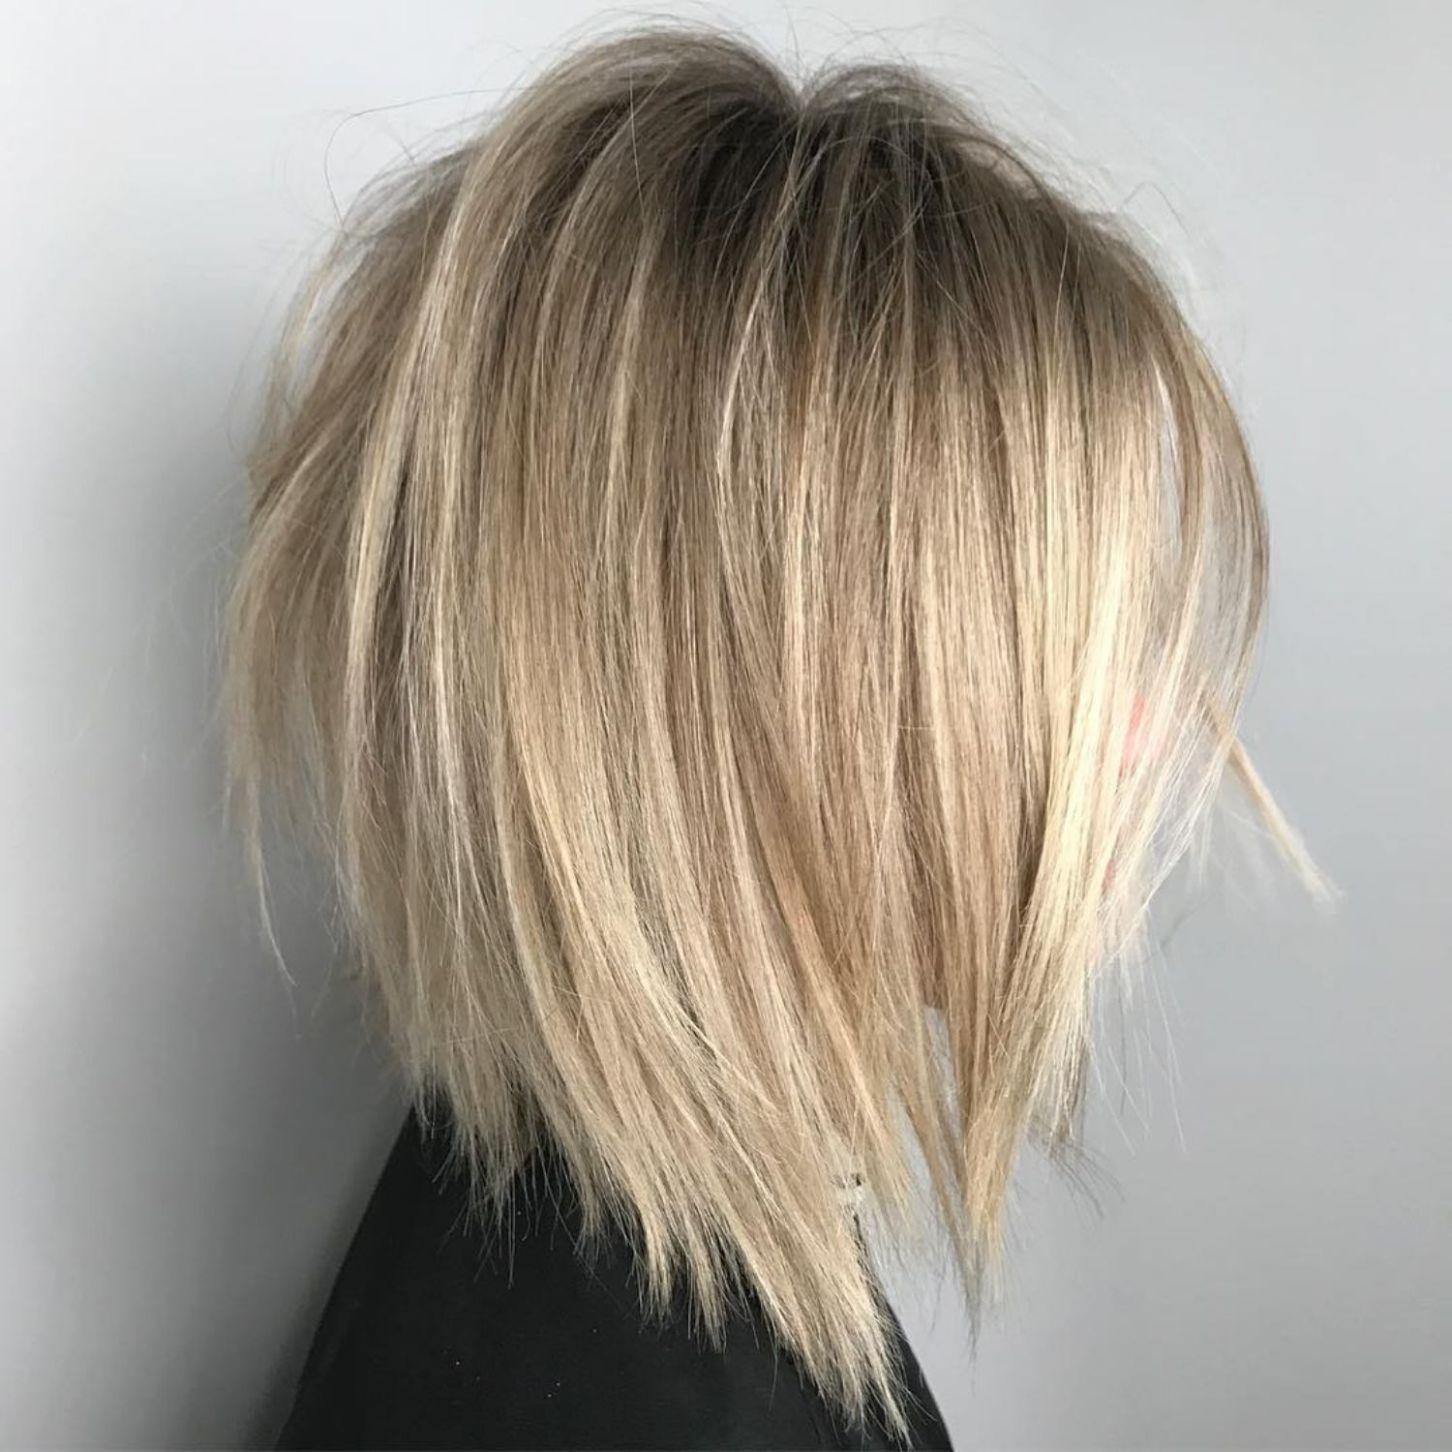 60 Beautiful And Convenient Medium Bob Hairstyles Hair Styles Thick Hair Styles Medium Bob Hairstyles